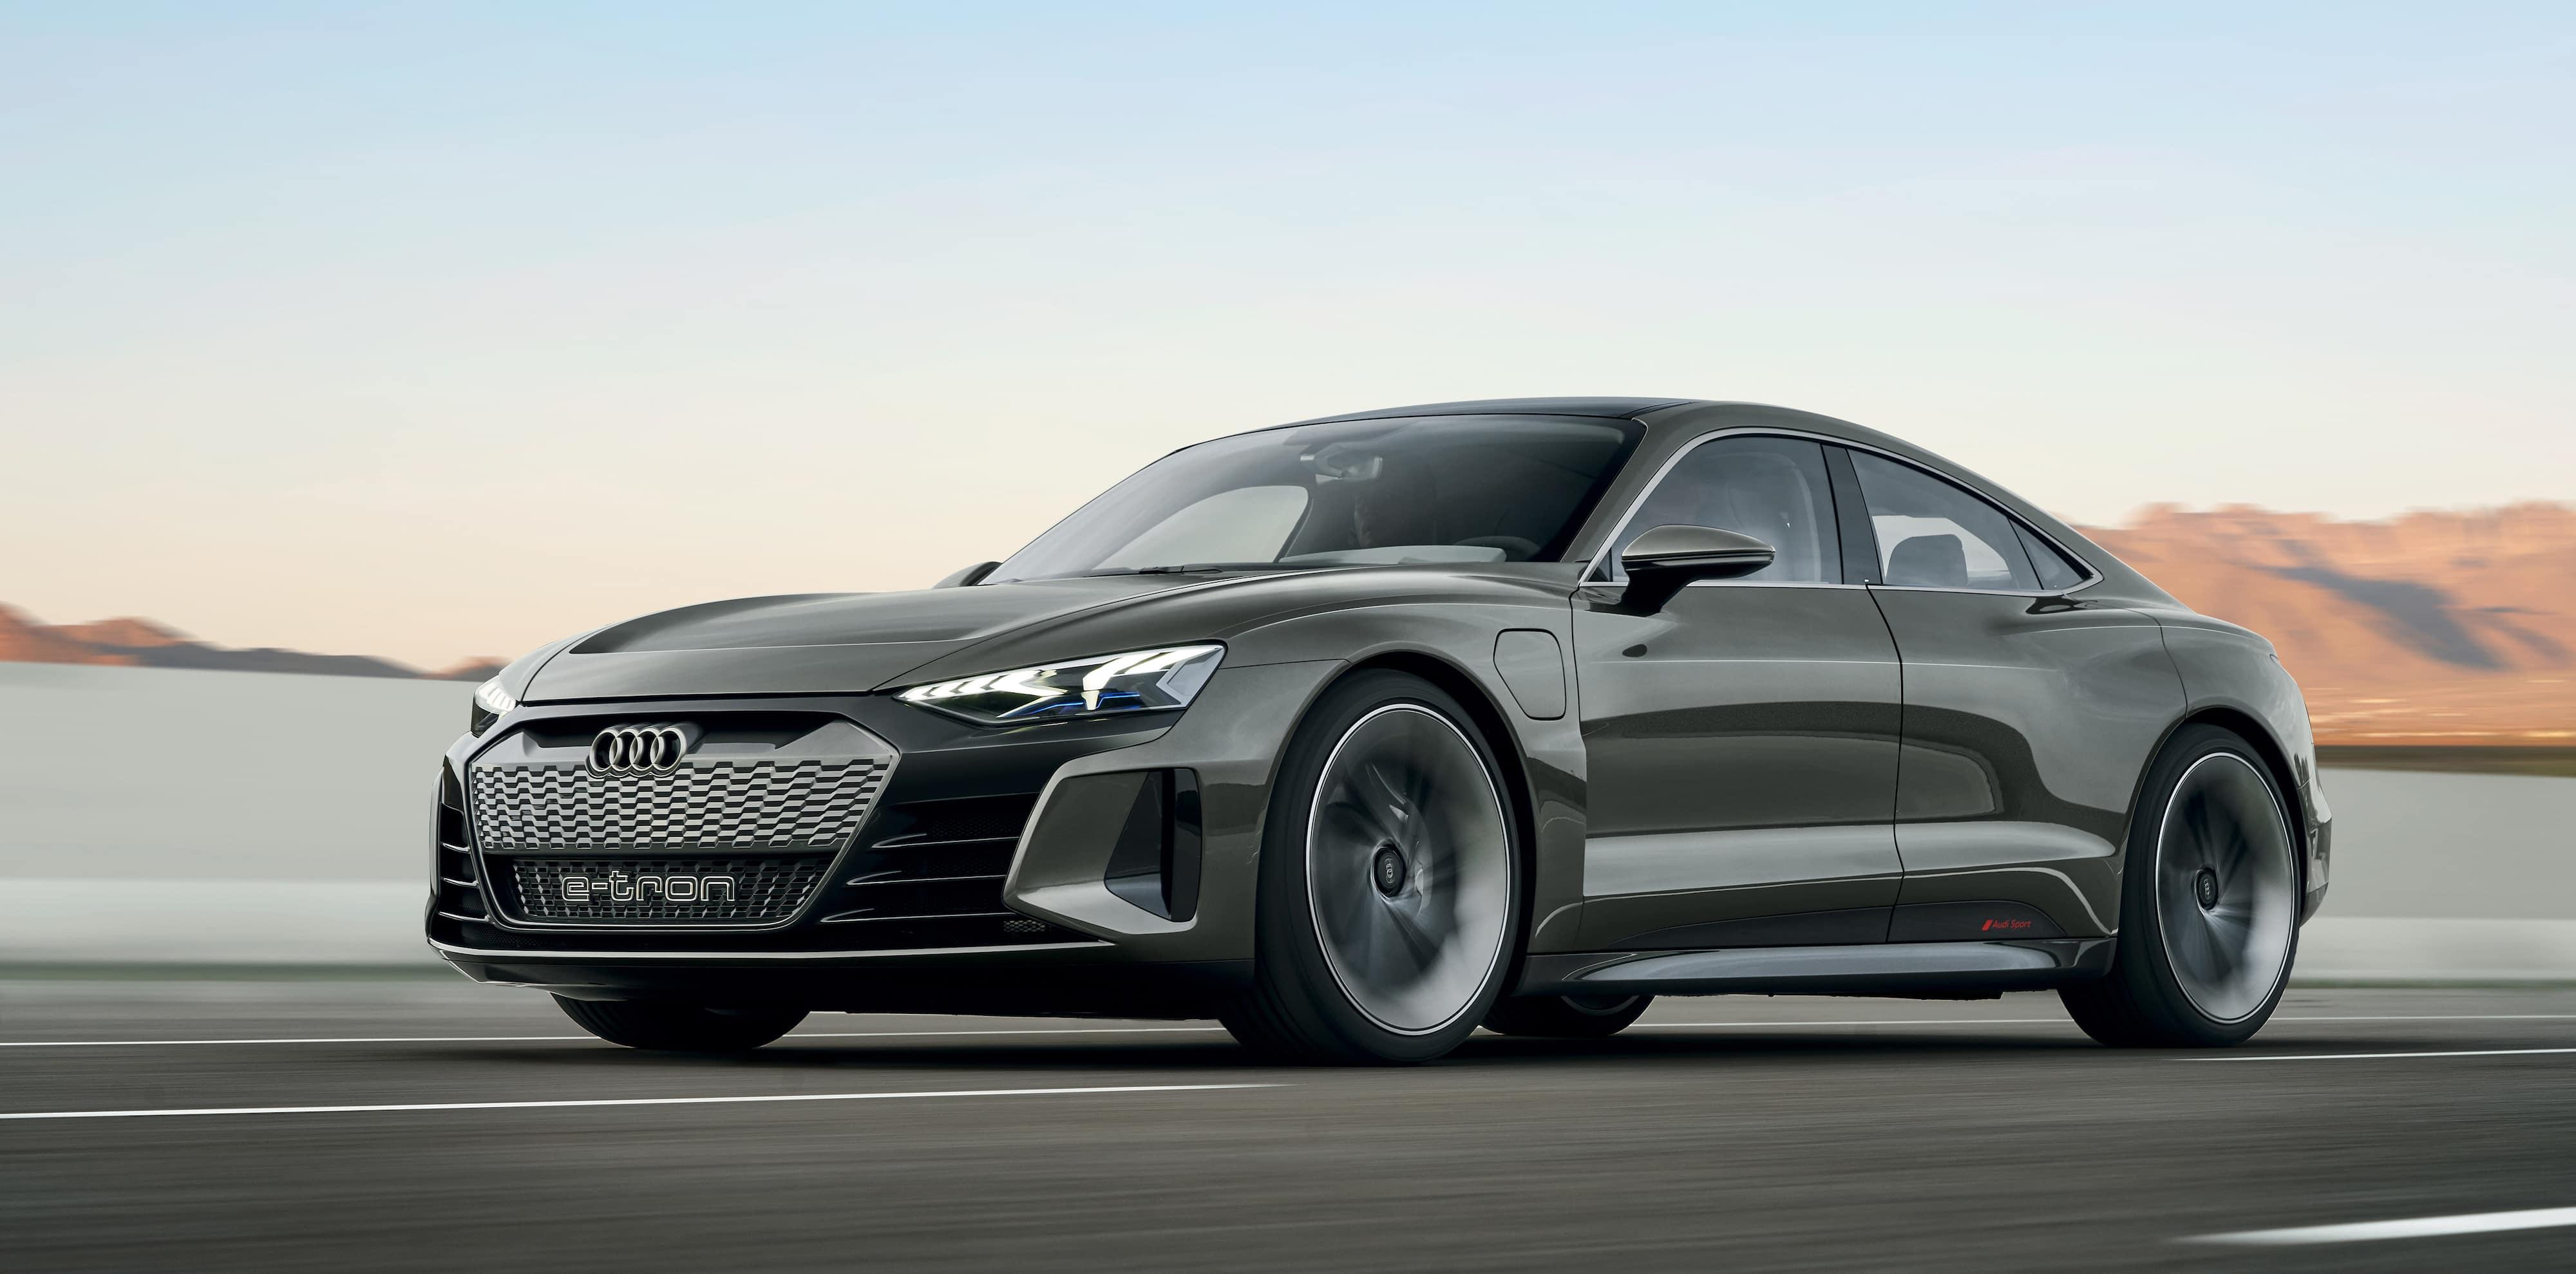 Her Er Audi E Tron Gt Concept Audi Norge